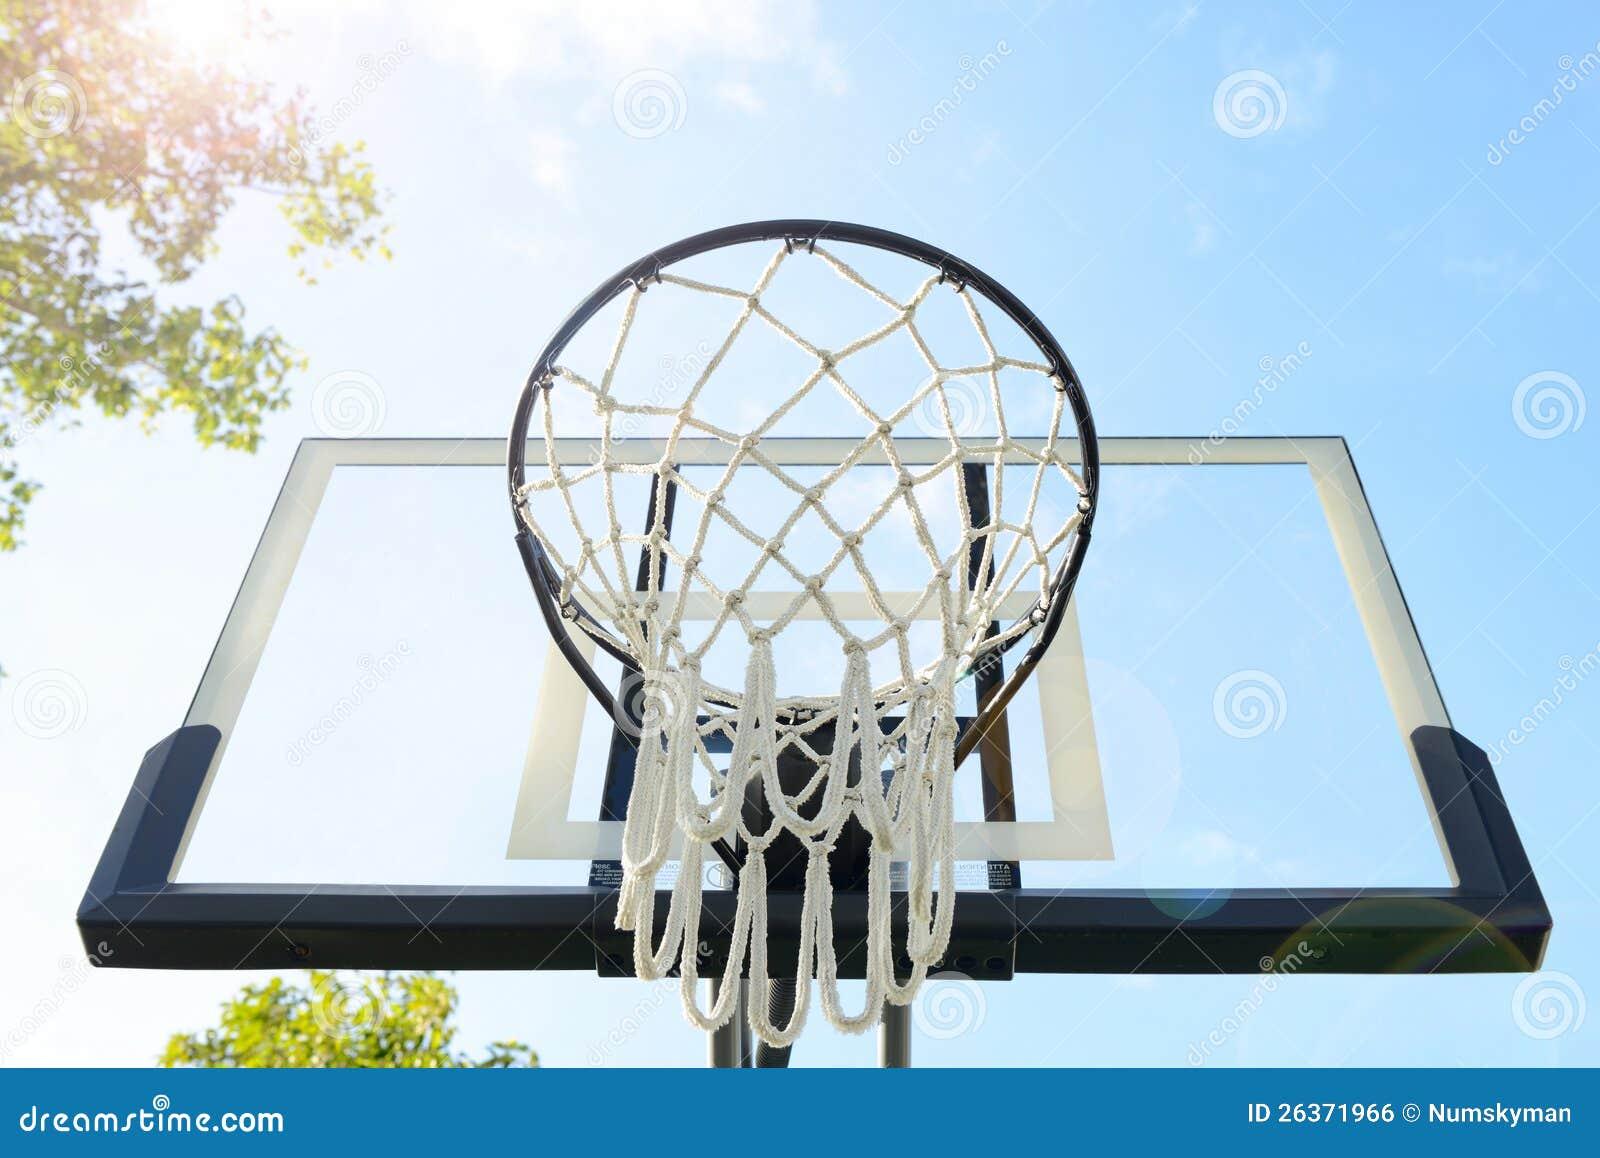 Der im Freienbasketball